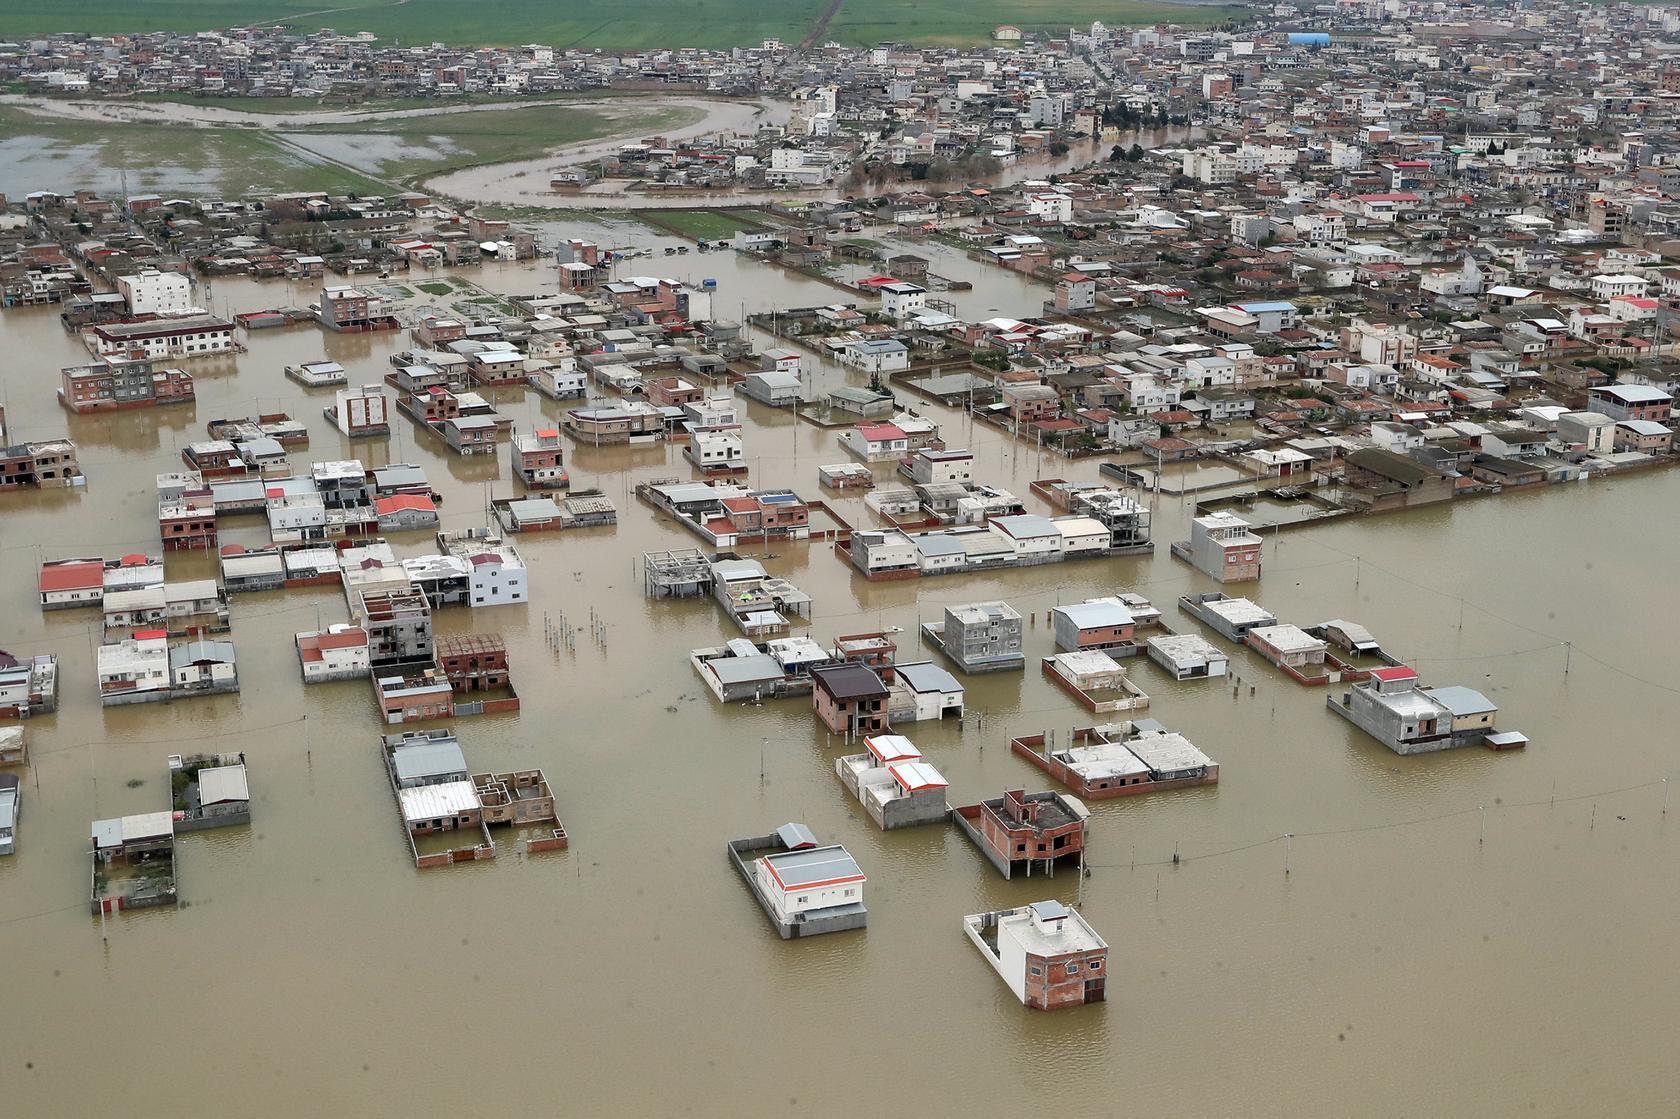 iran evacuates flood threatened villages after heavy rains kill dozens